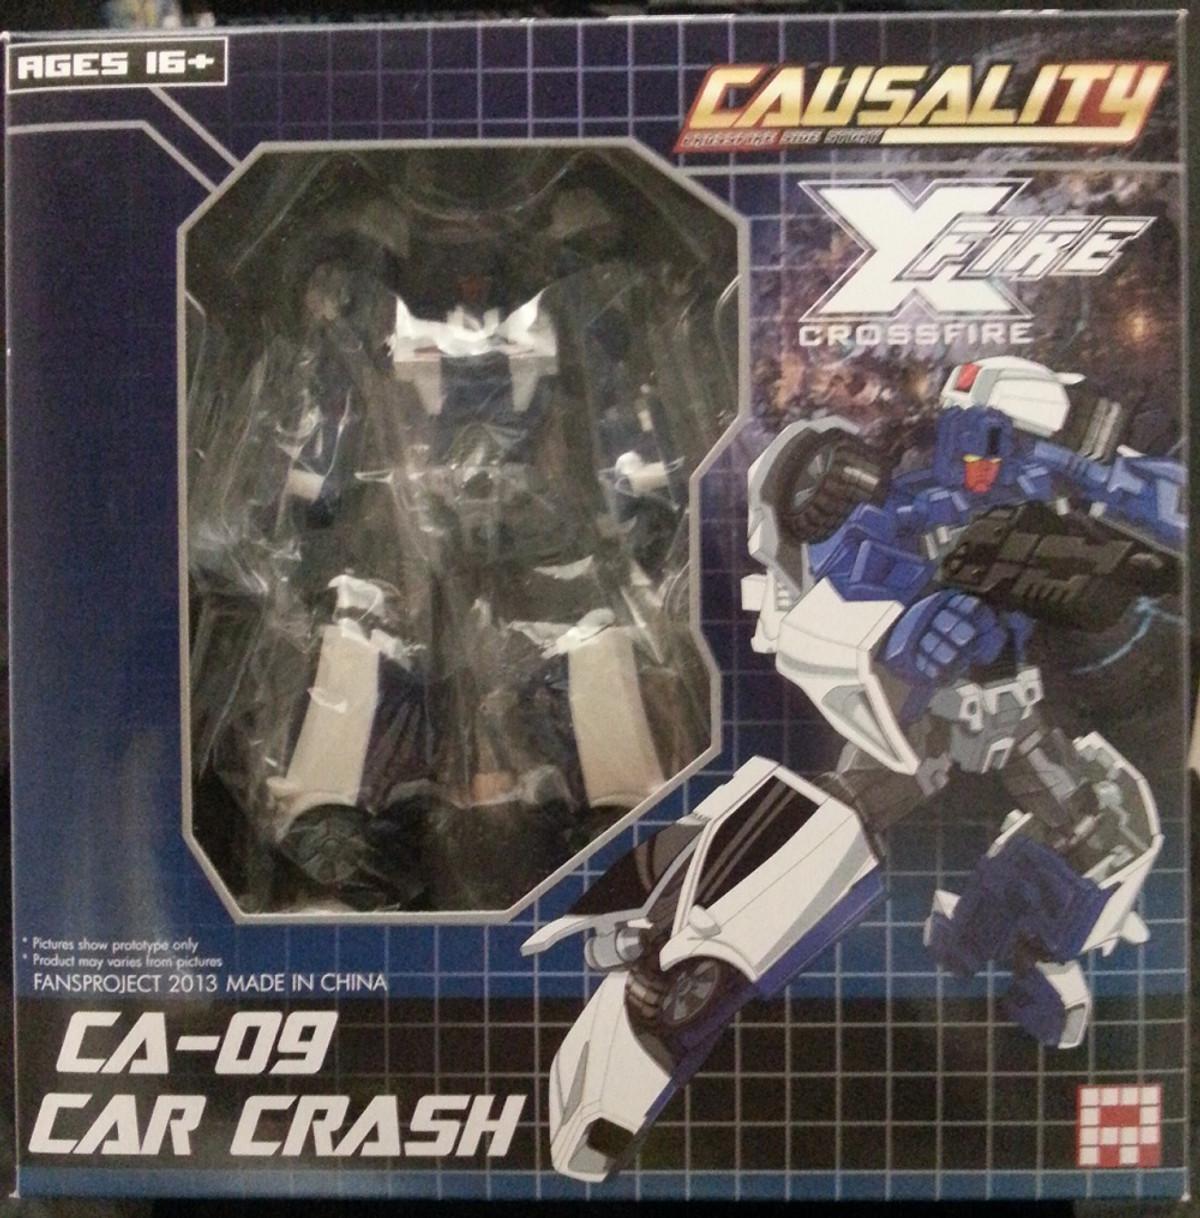 CA-09 Causality Car Crash